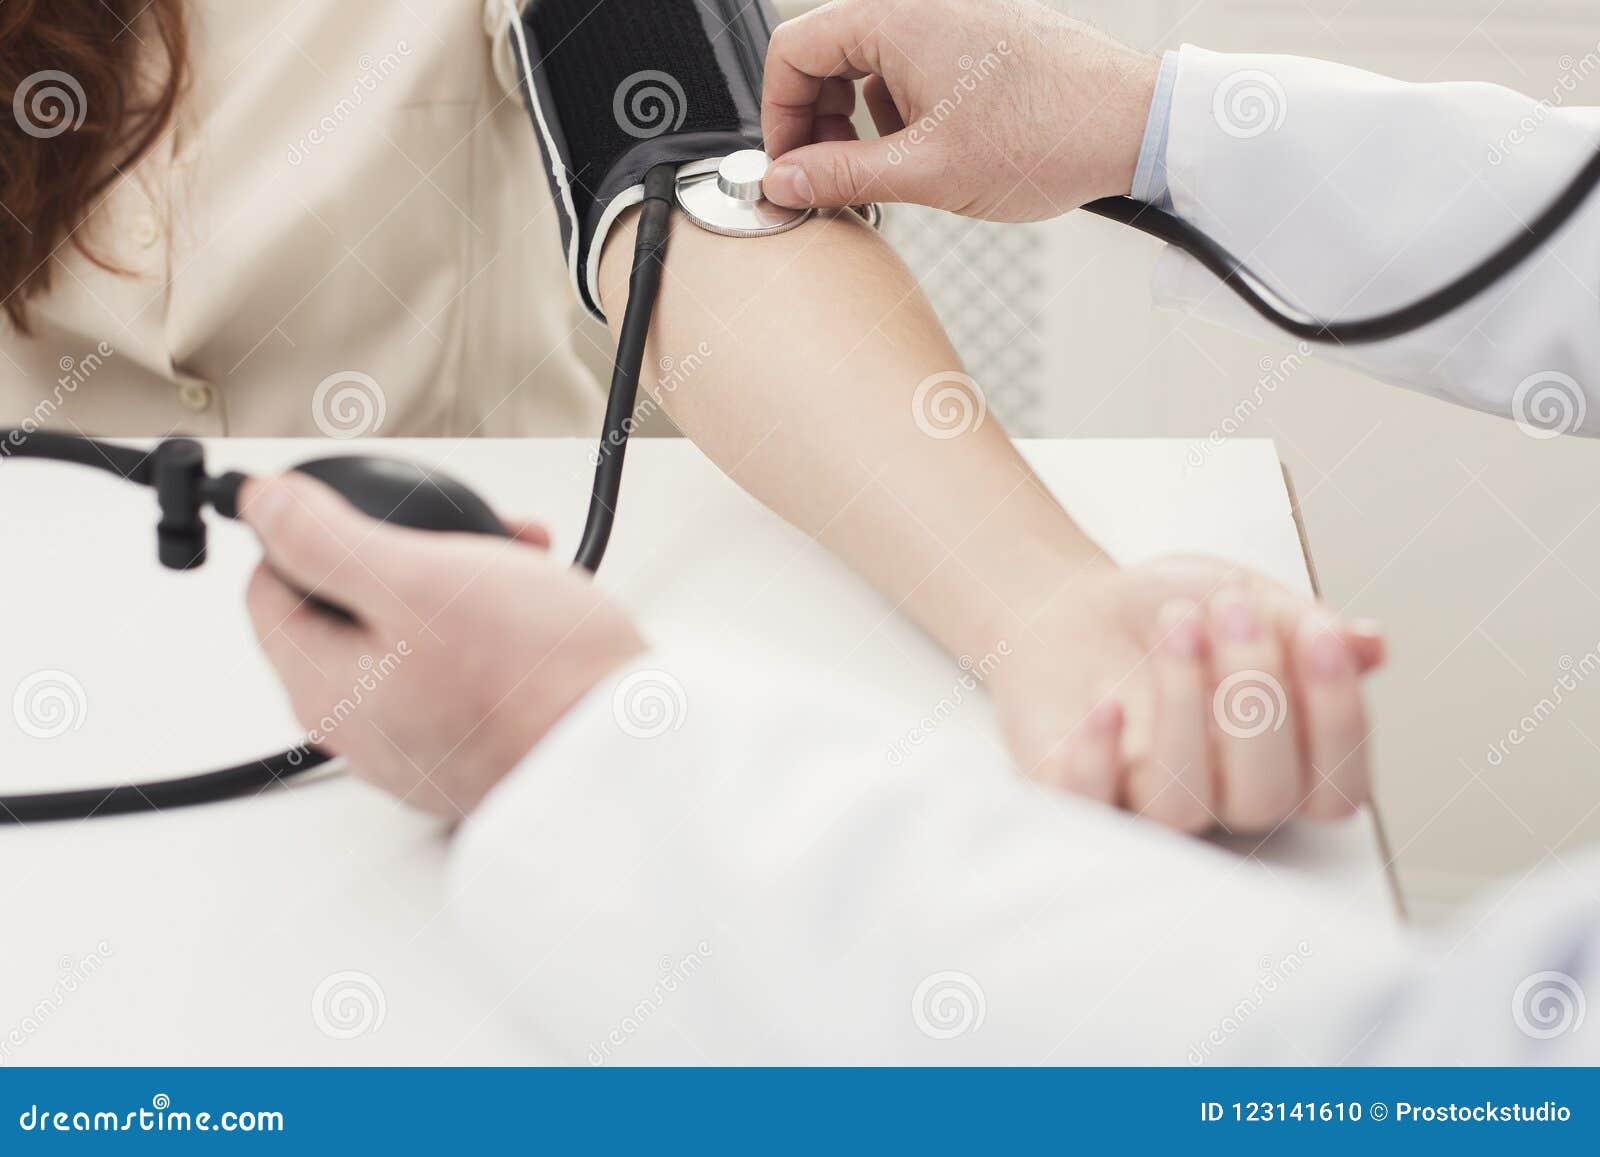 Closeup of doctor hand using tonometer